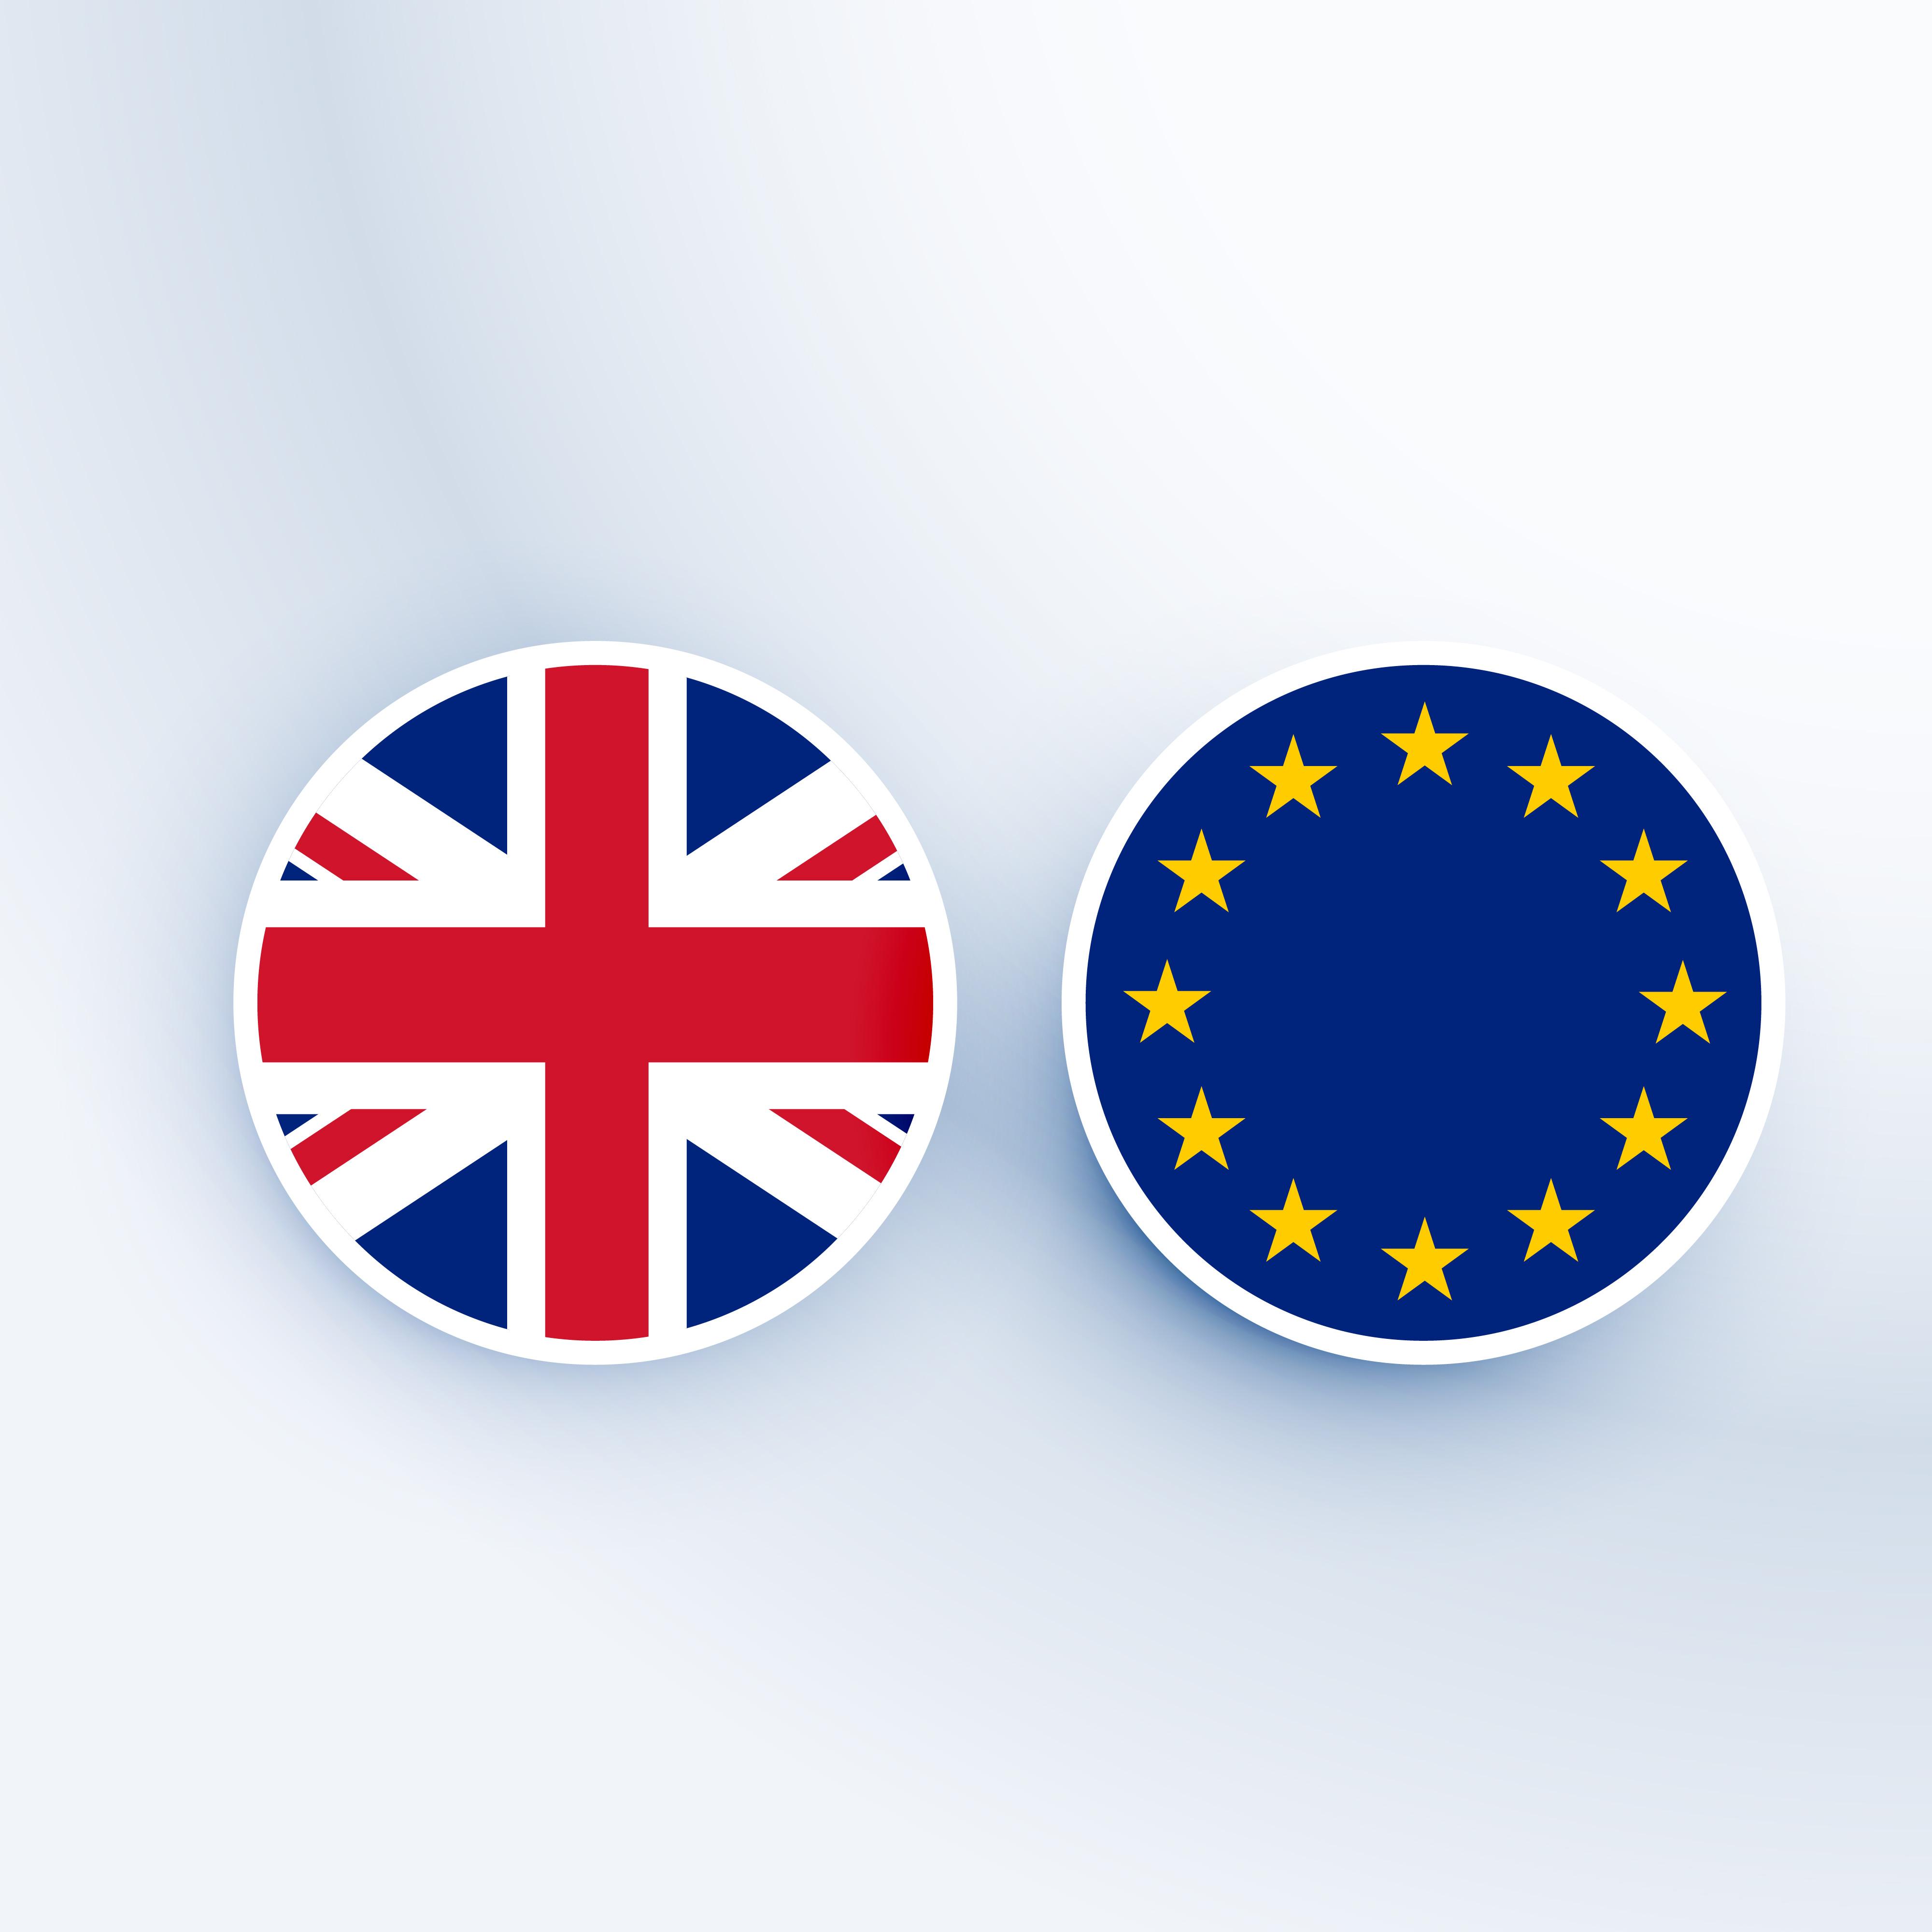 united kingdom and european union symbol and badges